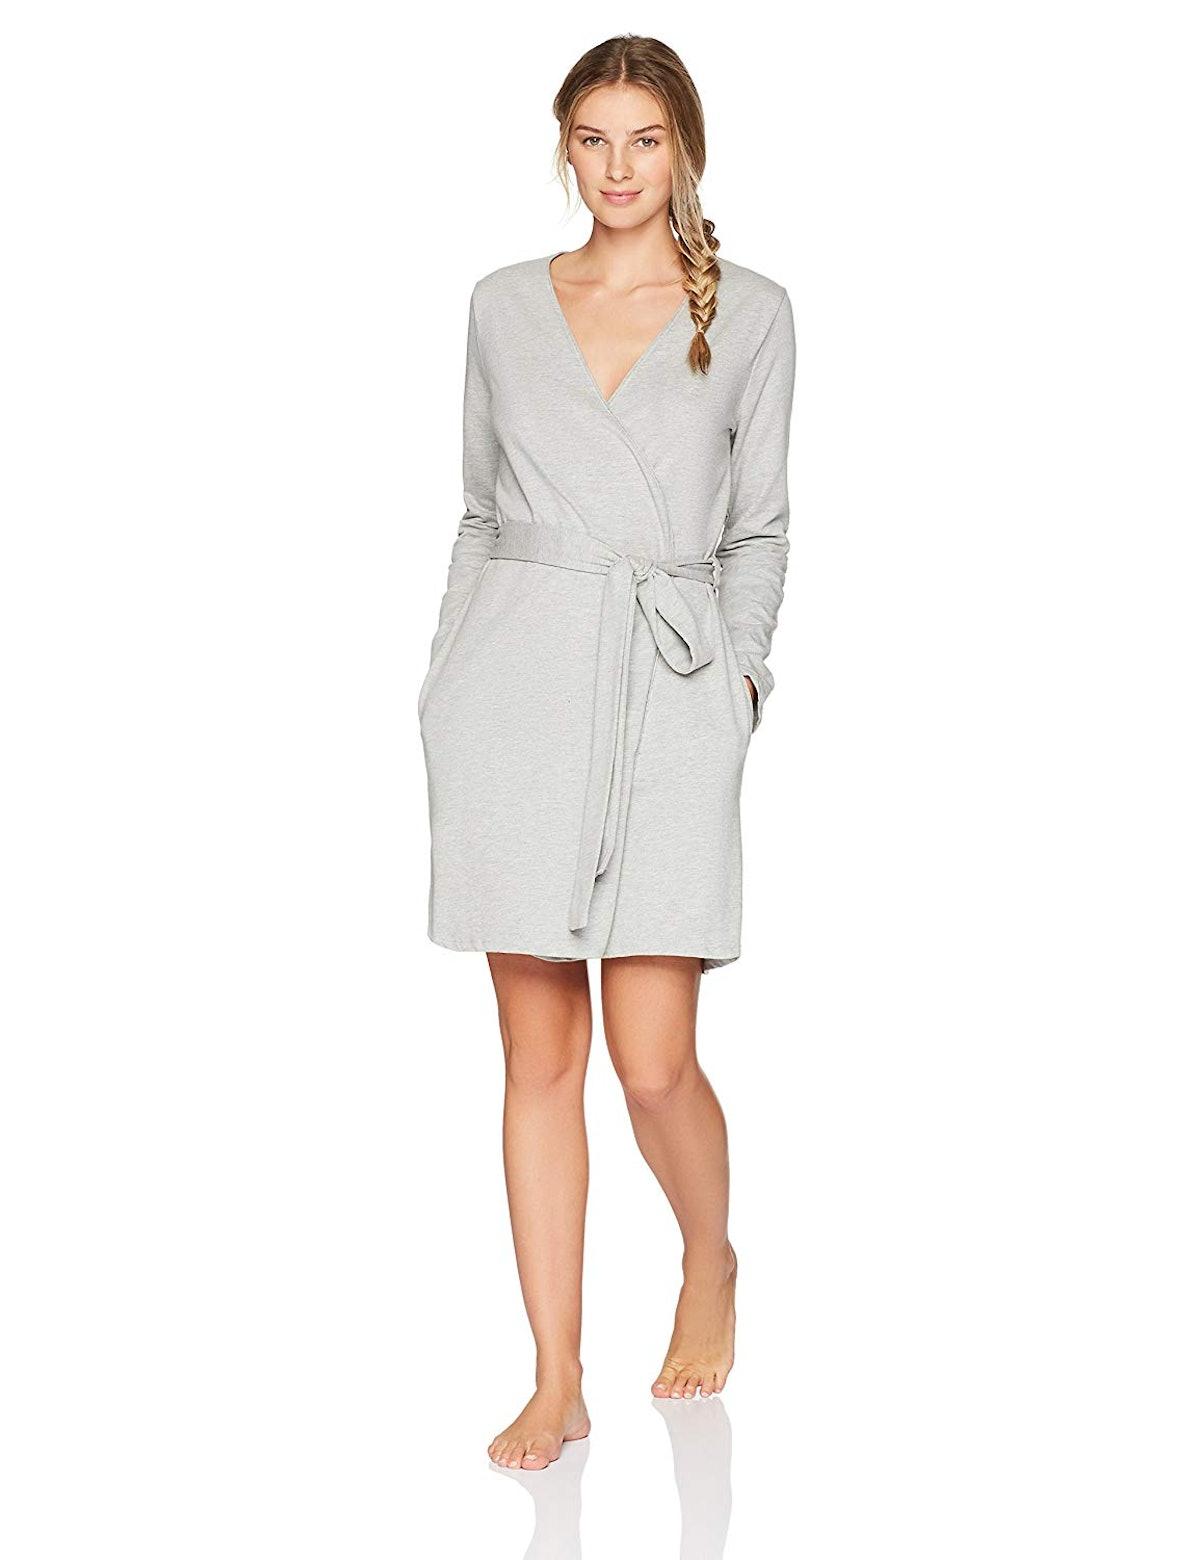 The Slumber Project Cotton Fleece Robe (S-XXL)